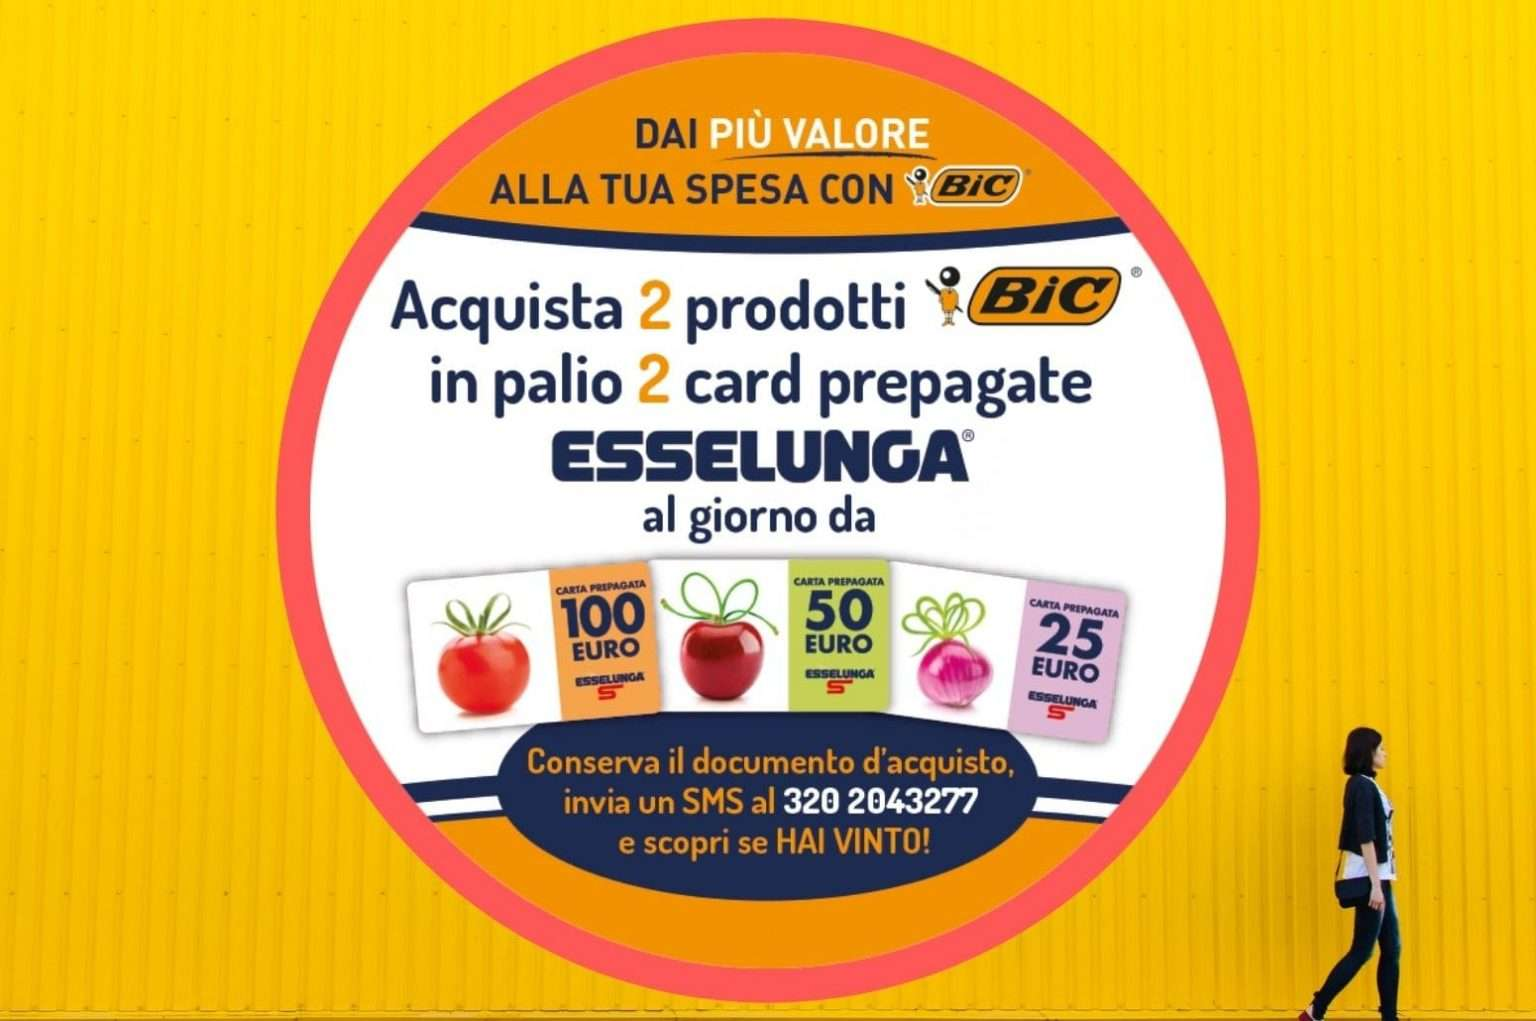 Concorso-Bic-vinci-buoni-spesa-Esselunga GosuMania